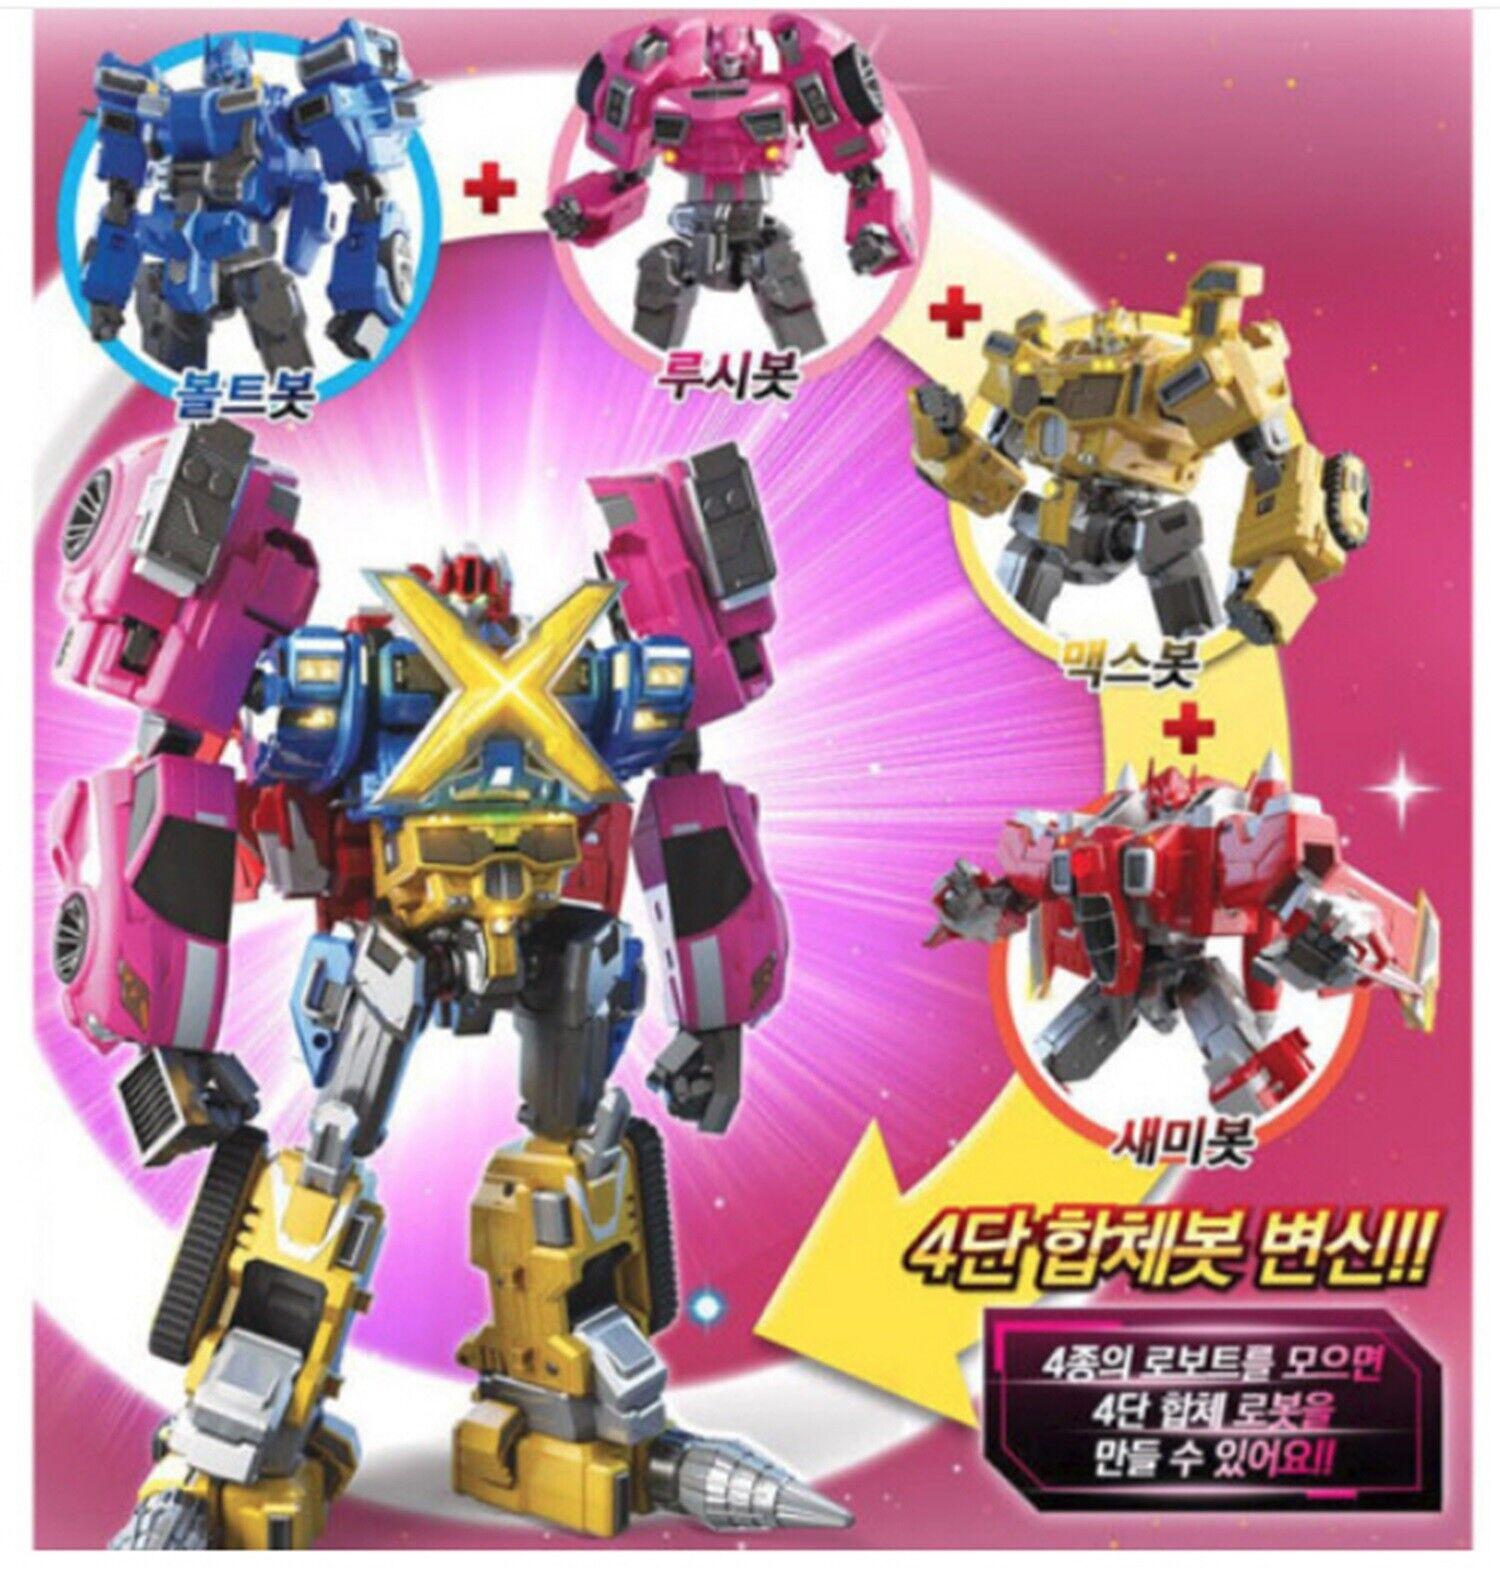 Set Completo De 4 Robot Miniforce X Transformer Robot BOLTBOT, LUCYBOT, MAXBOT, semibot